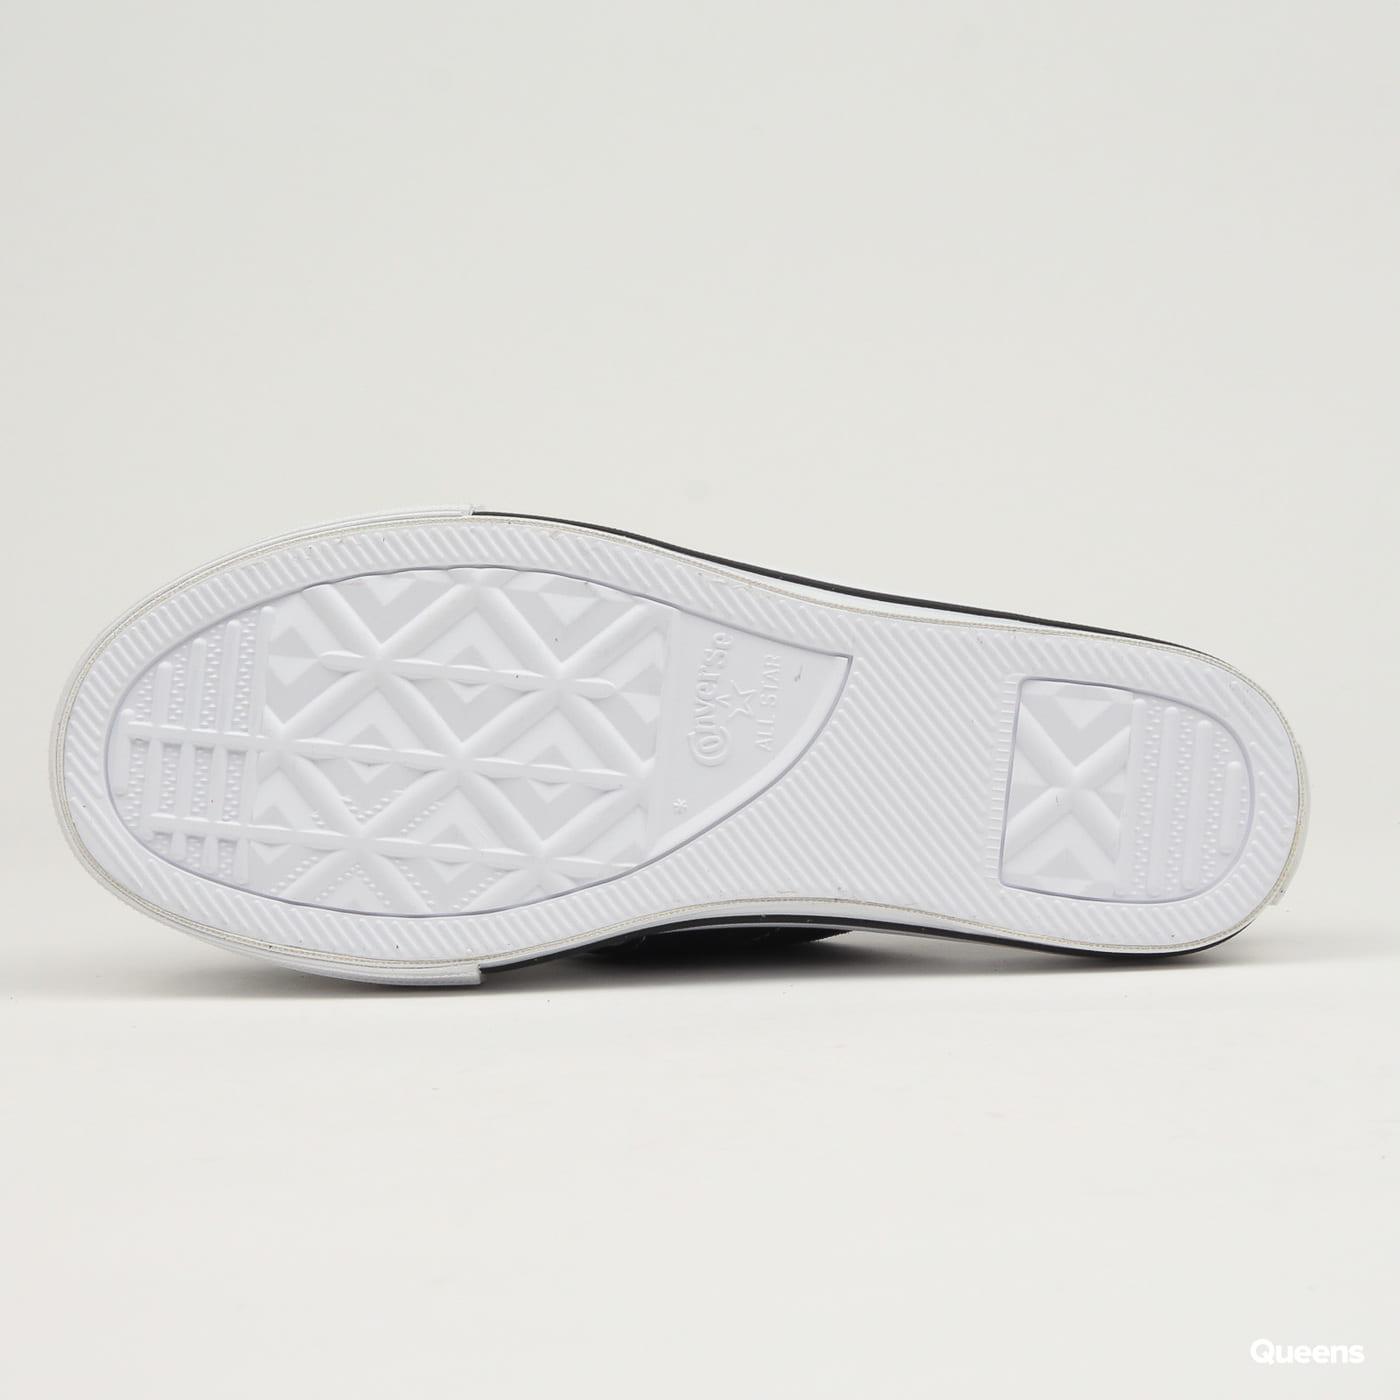 Converse One Star Sandal Slip black / egret / white